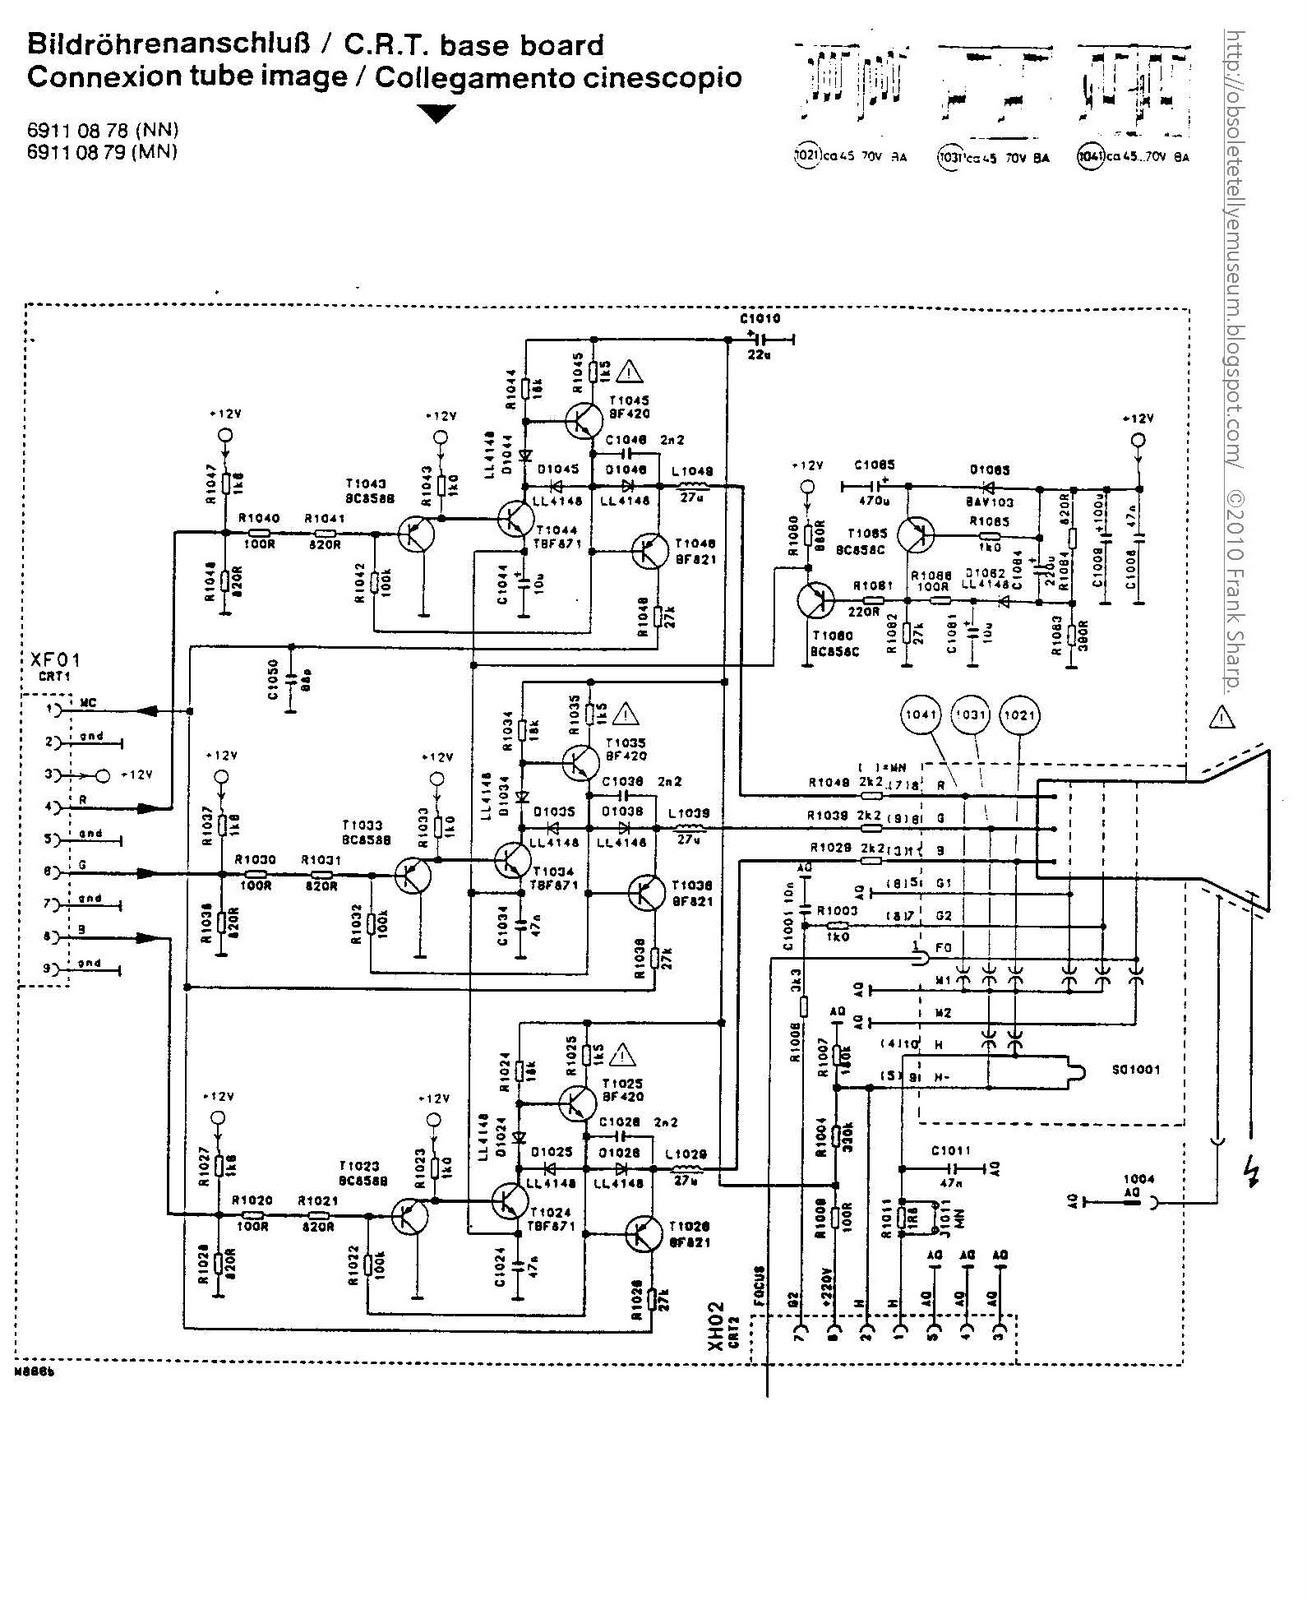 clarion head unit wiring diagram clarion image car radio wiring diagram clarion drx5575 car auto wiring diagram on clarion head unit wiring diagram